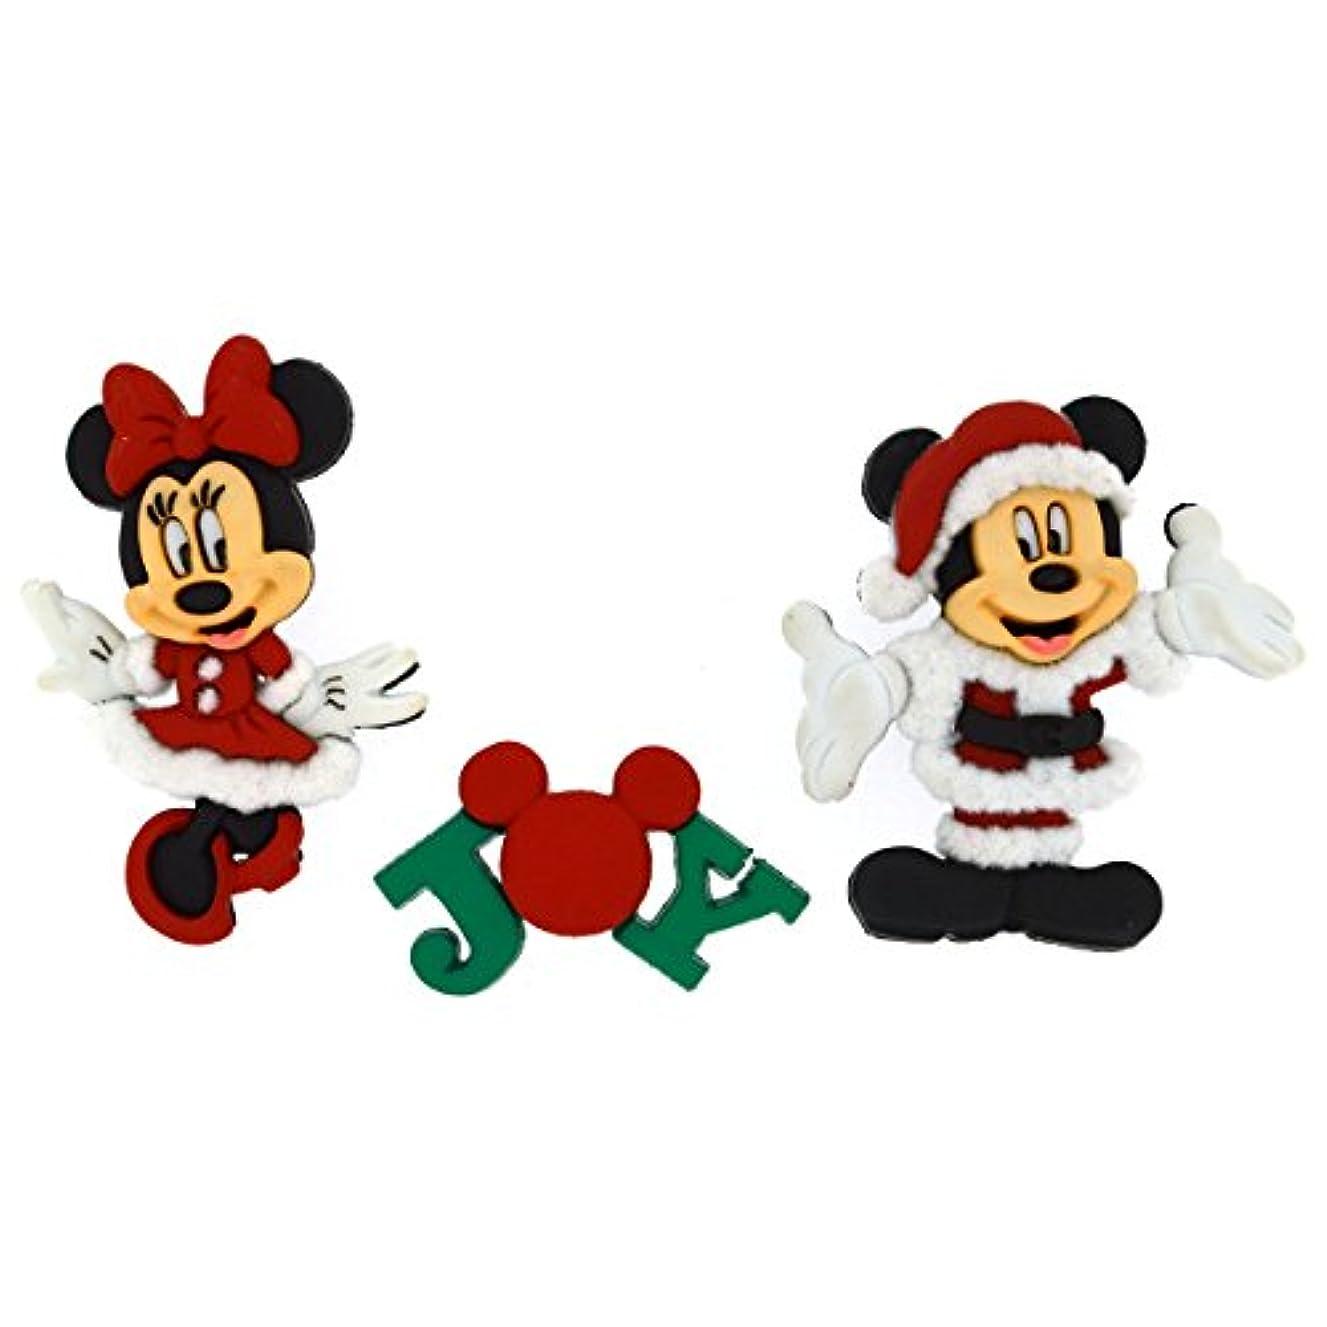 Dress It Up 8235 Disney Button & Embellishments, Mickey & Minnie